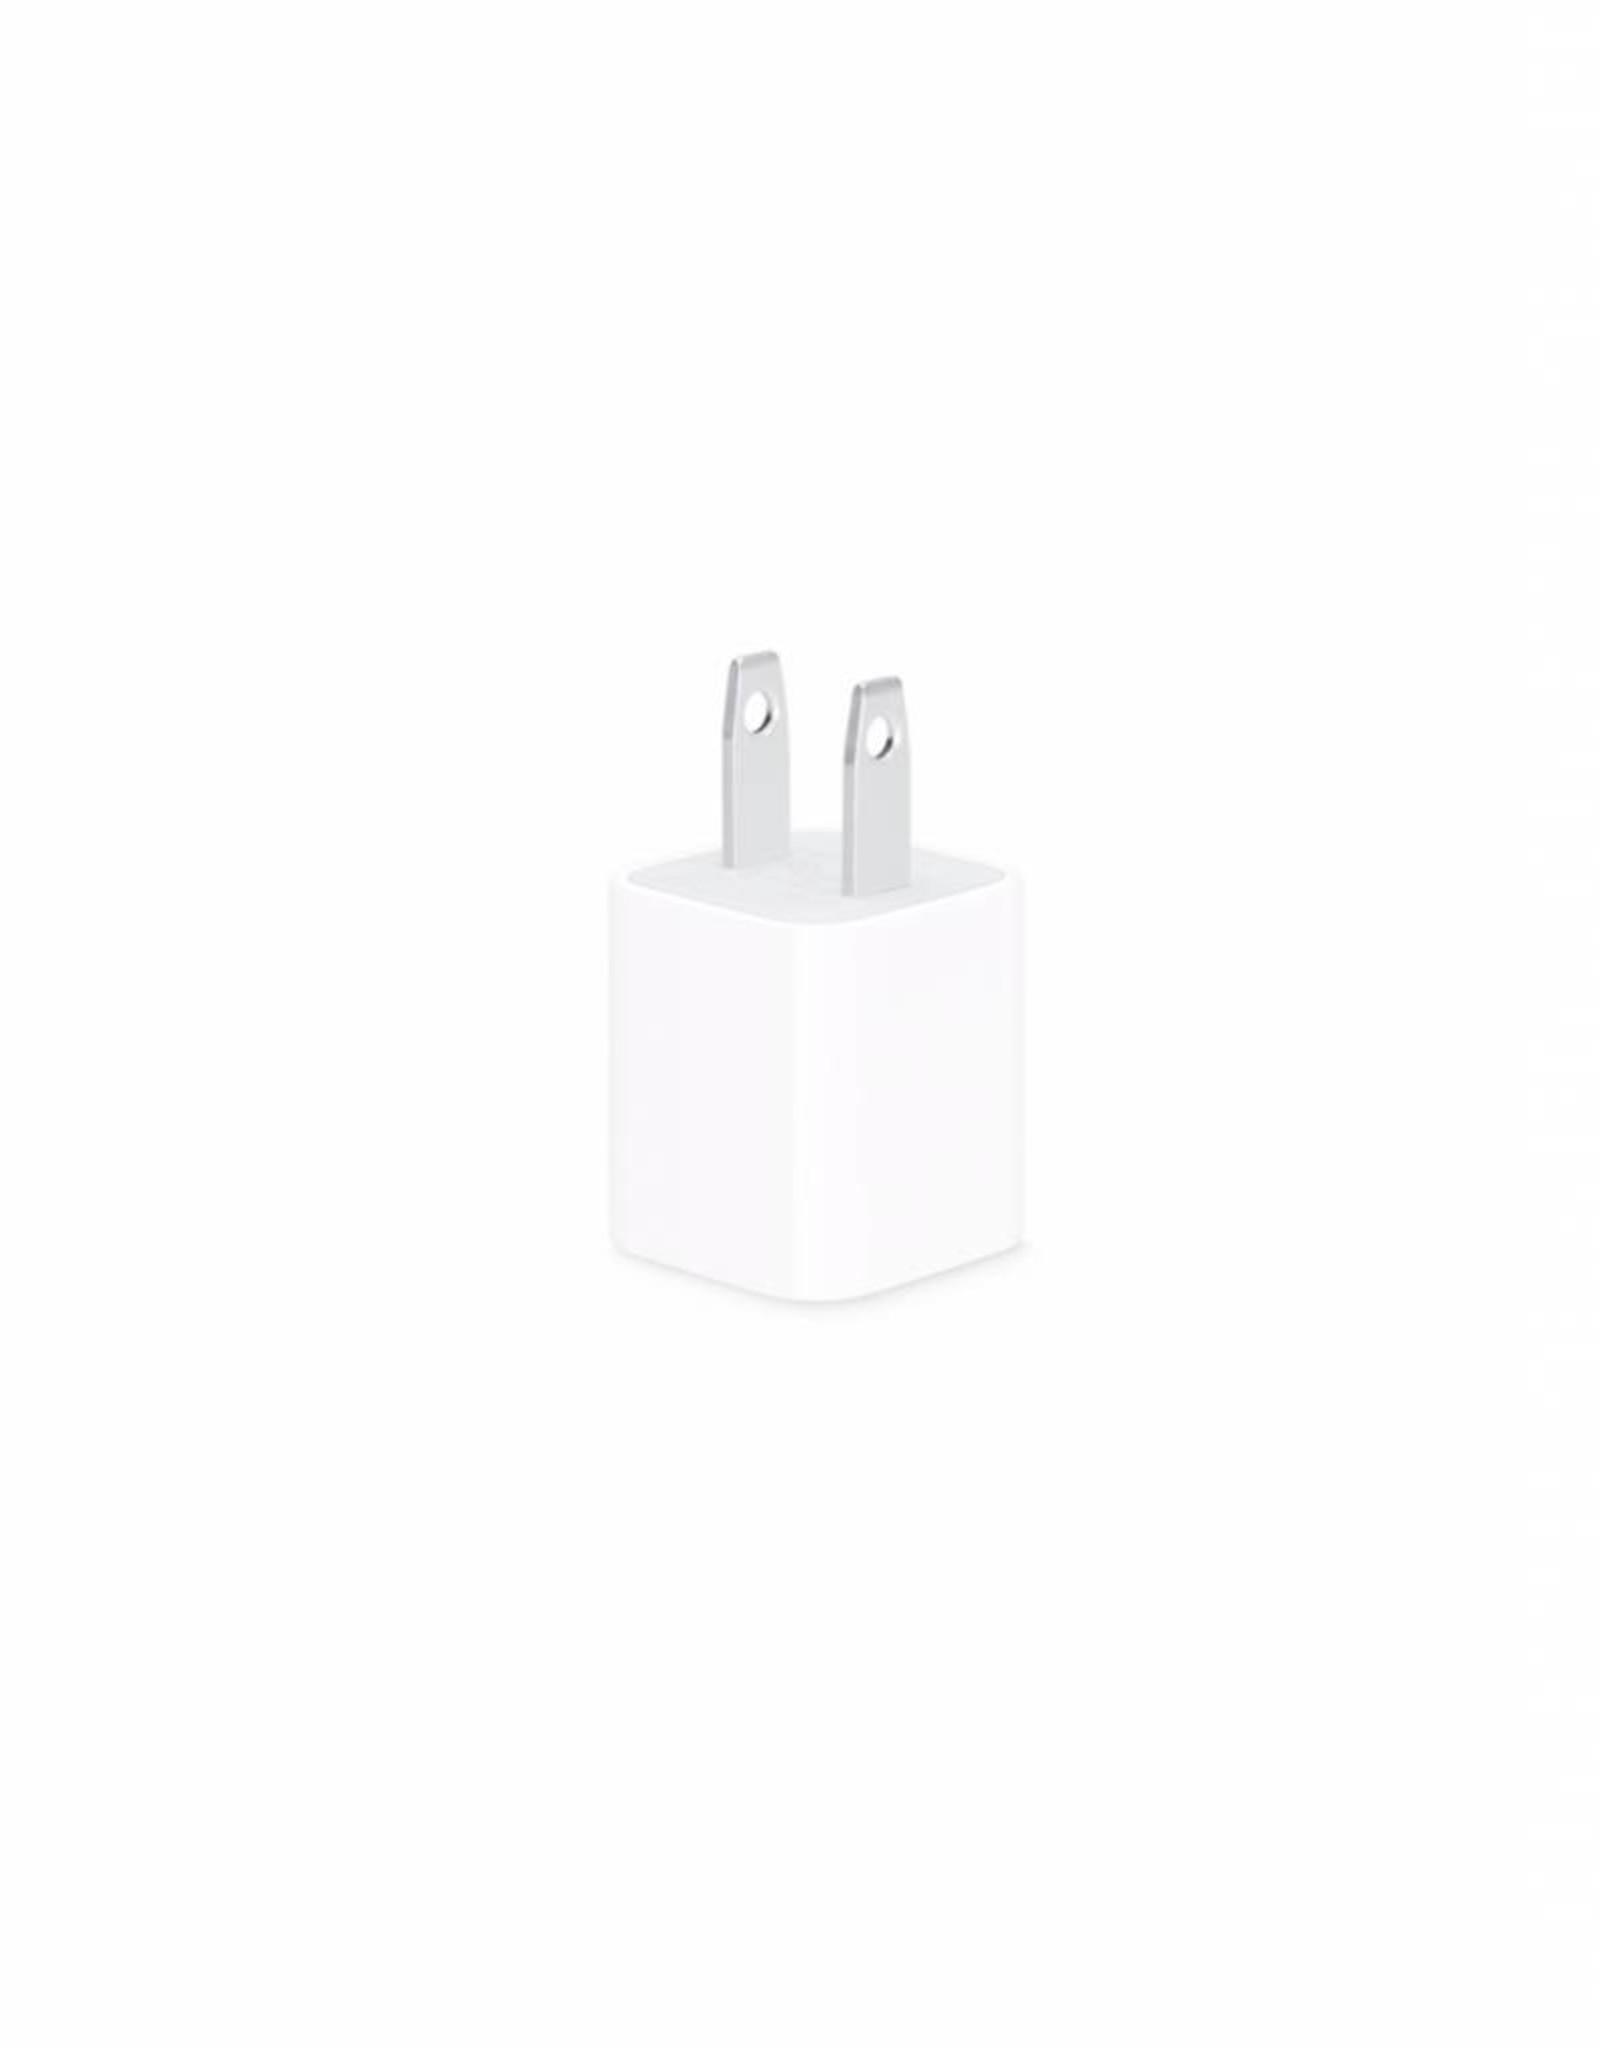 Apple APPLE 5W USB POWER ADAPTER (IPHONE)